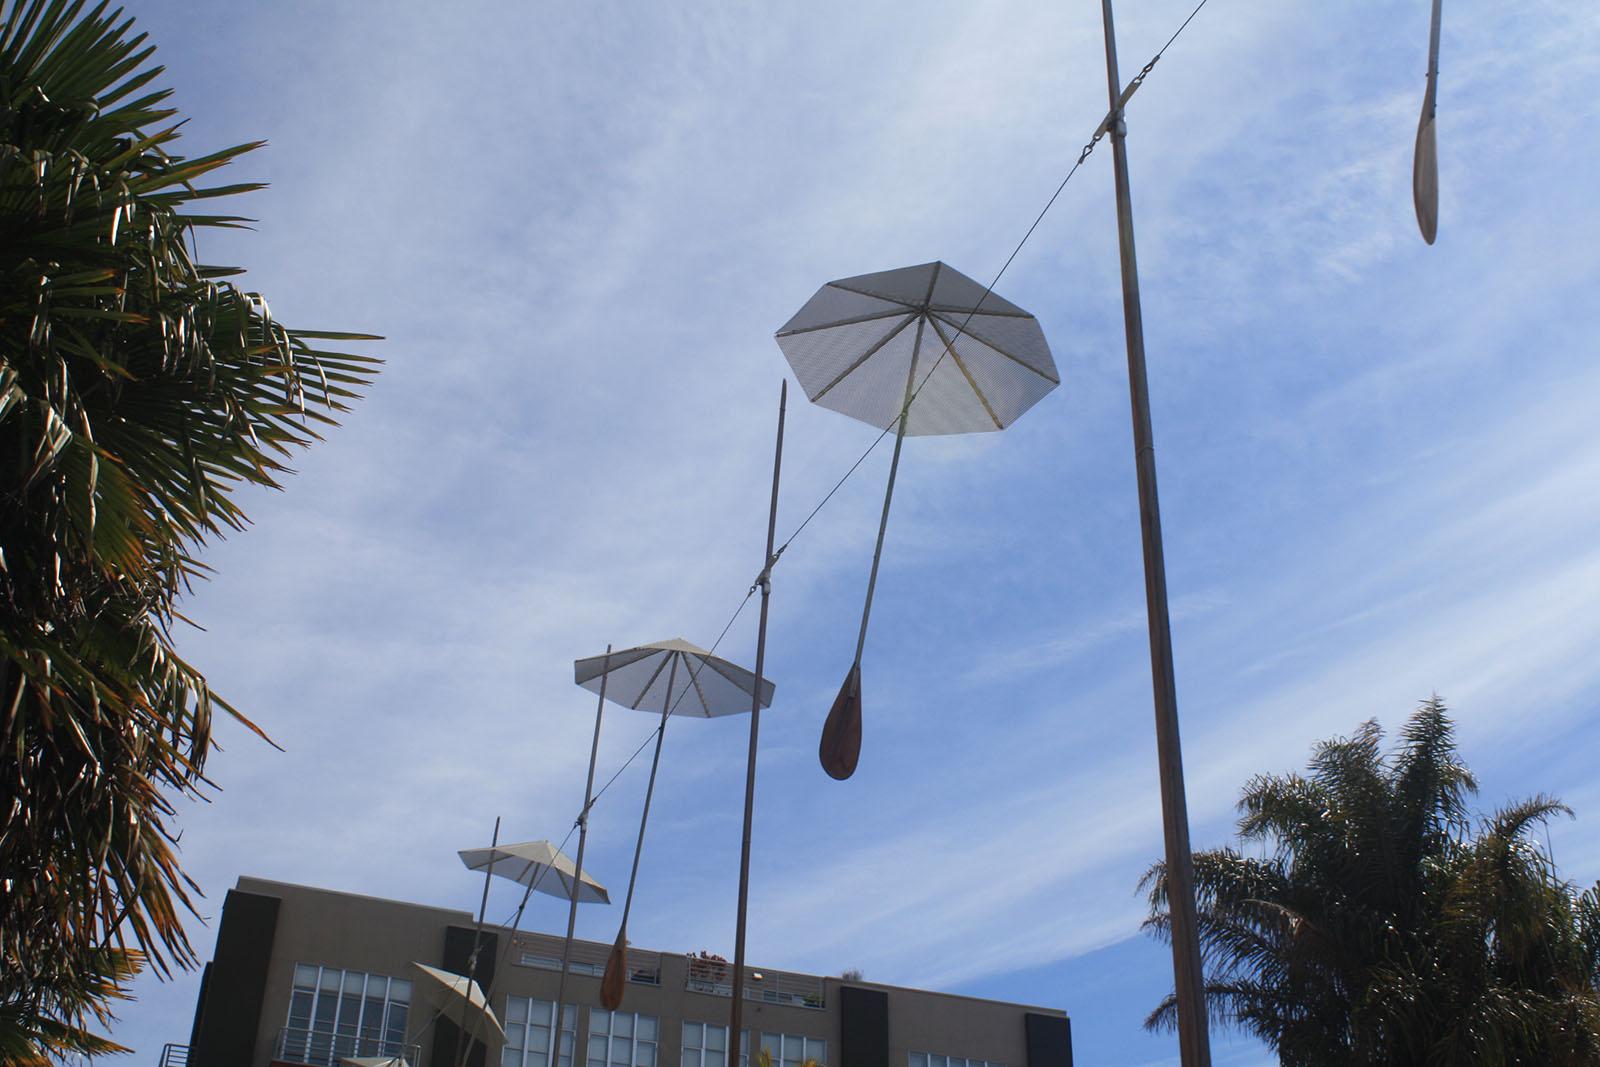 SNAP: Floating Umbrellas